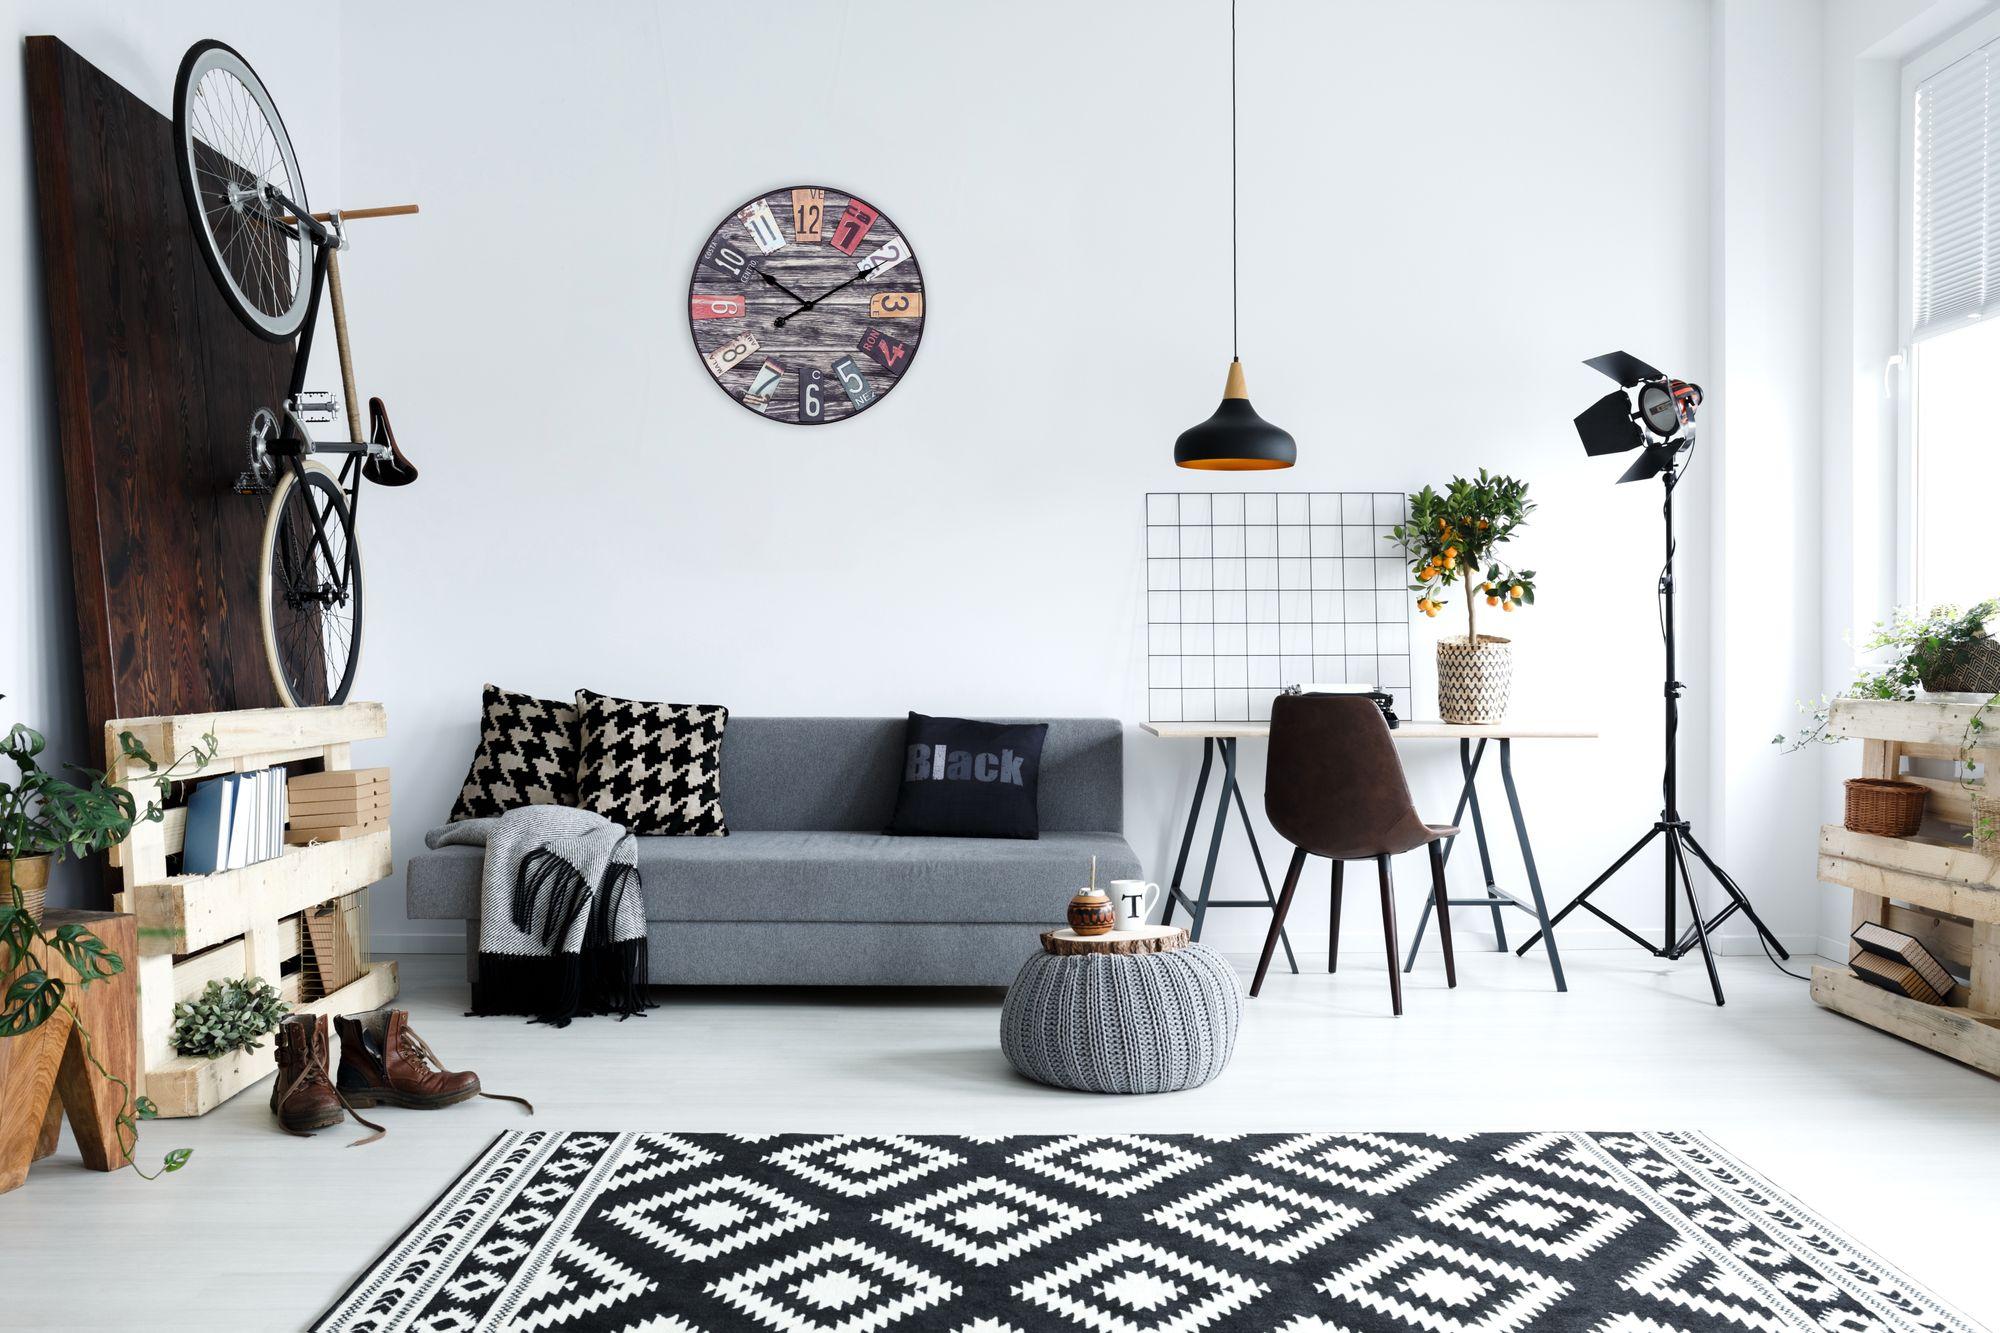 Wanduhr Design Modern ~ Finebuy wanduhr xxl Ø 60 cm big time design küchenuhr vintage look